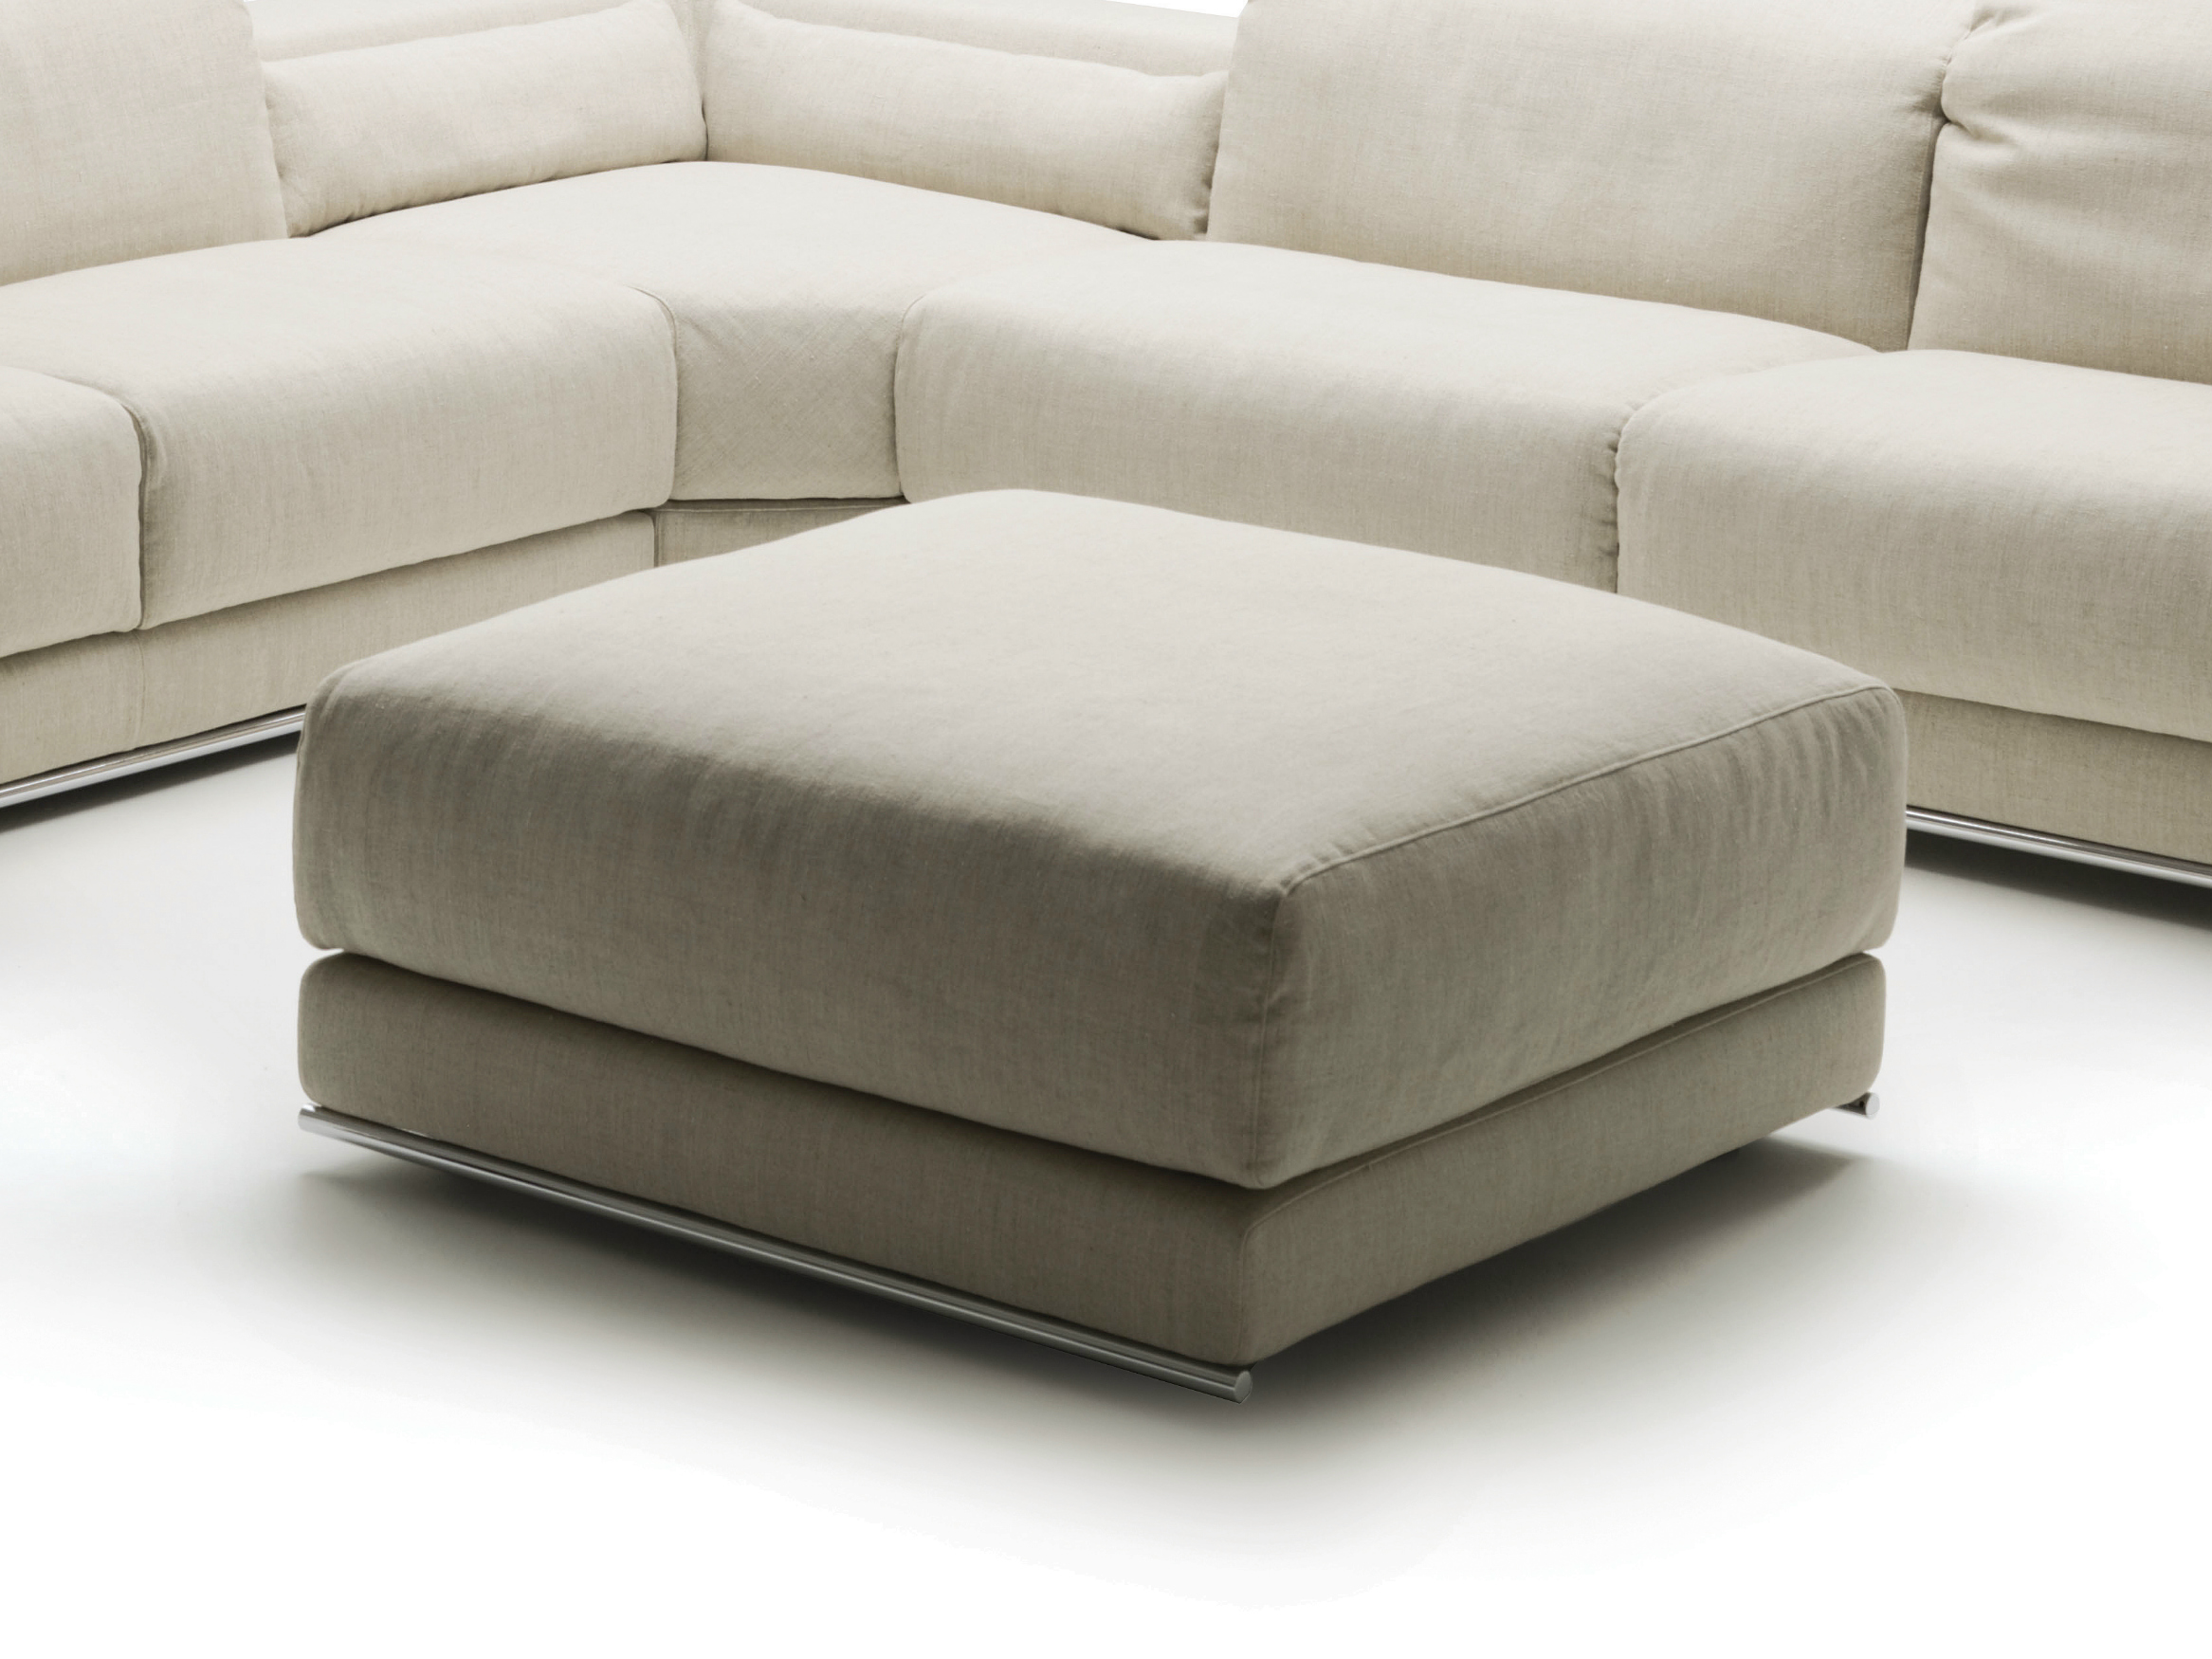 joe pouf joe collection by milano bedding design. Black Bedroom Furniture Sets. Home Design Ideas